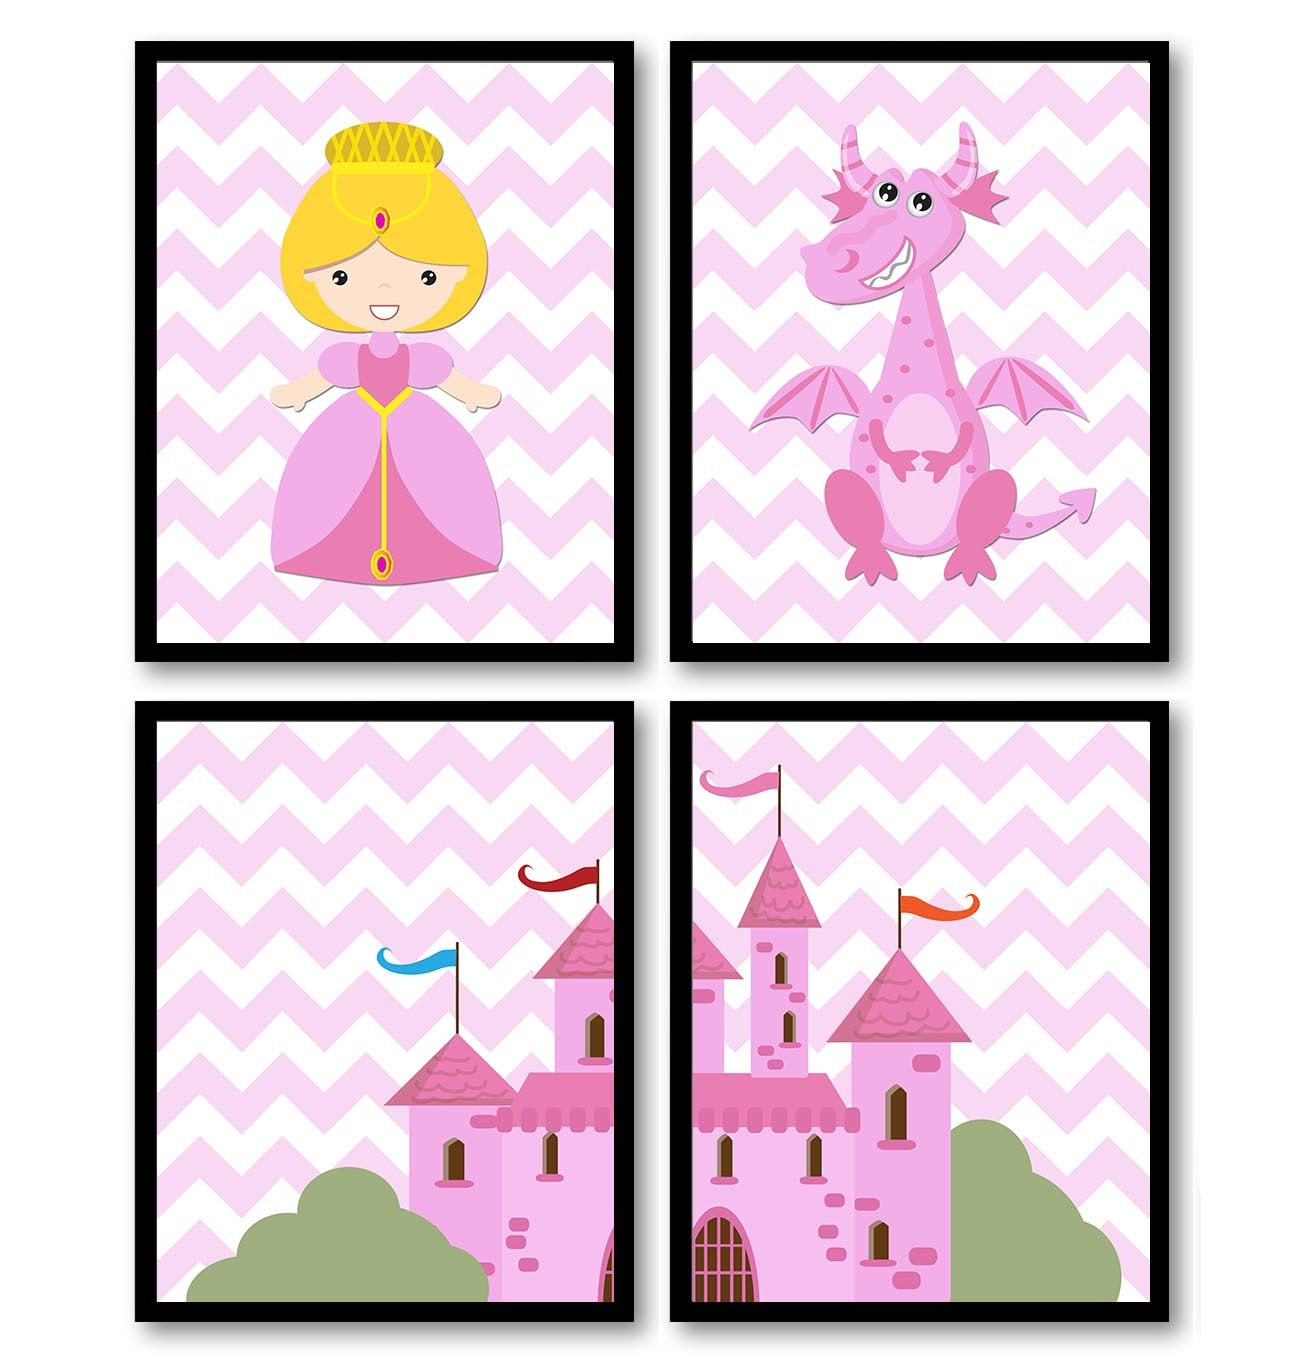 Fairy Tale Nursery Art Child Baby Set of 4 Art Prints Pink Chevron Girl Princess Dragon Castle Kids